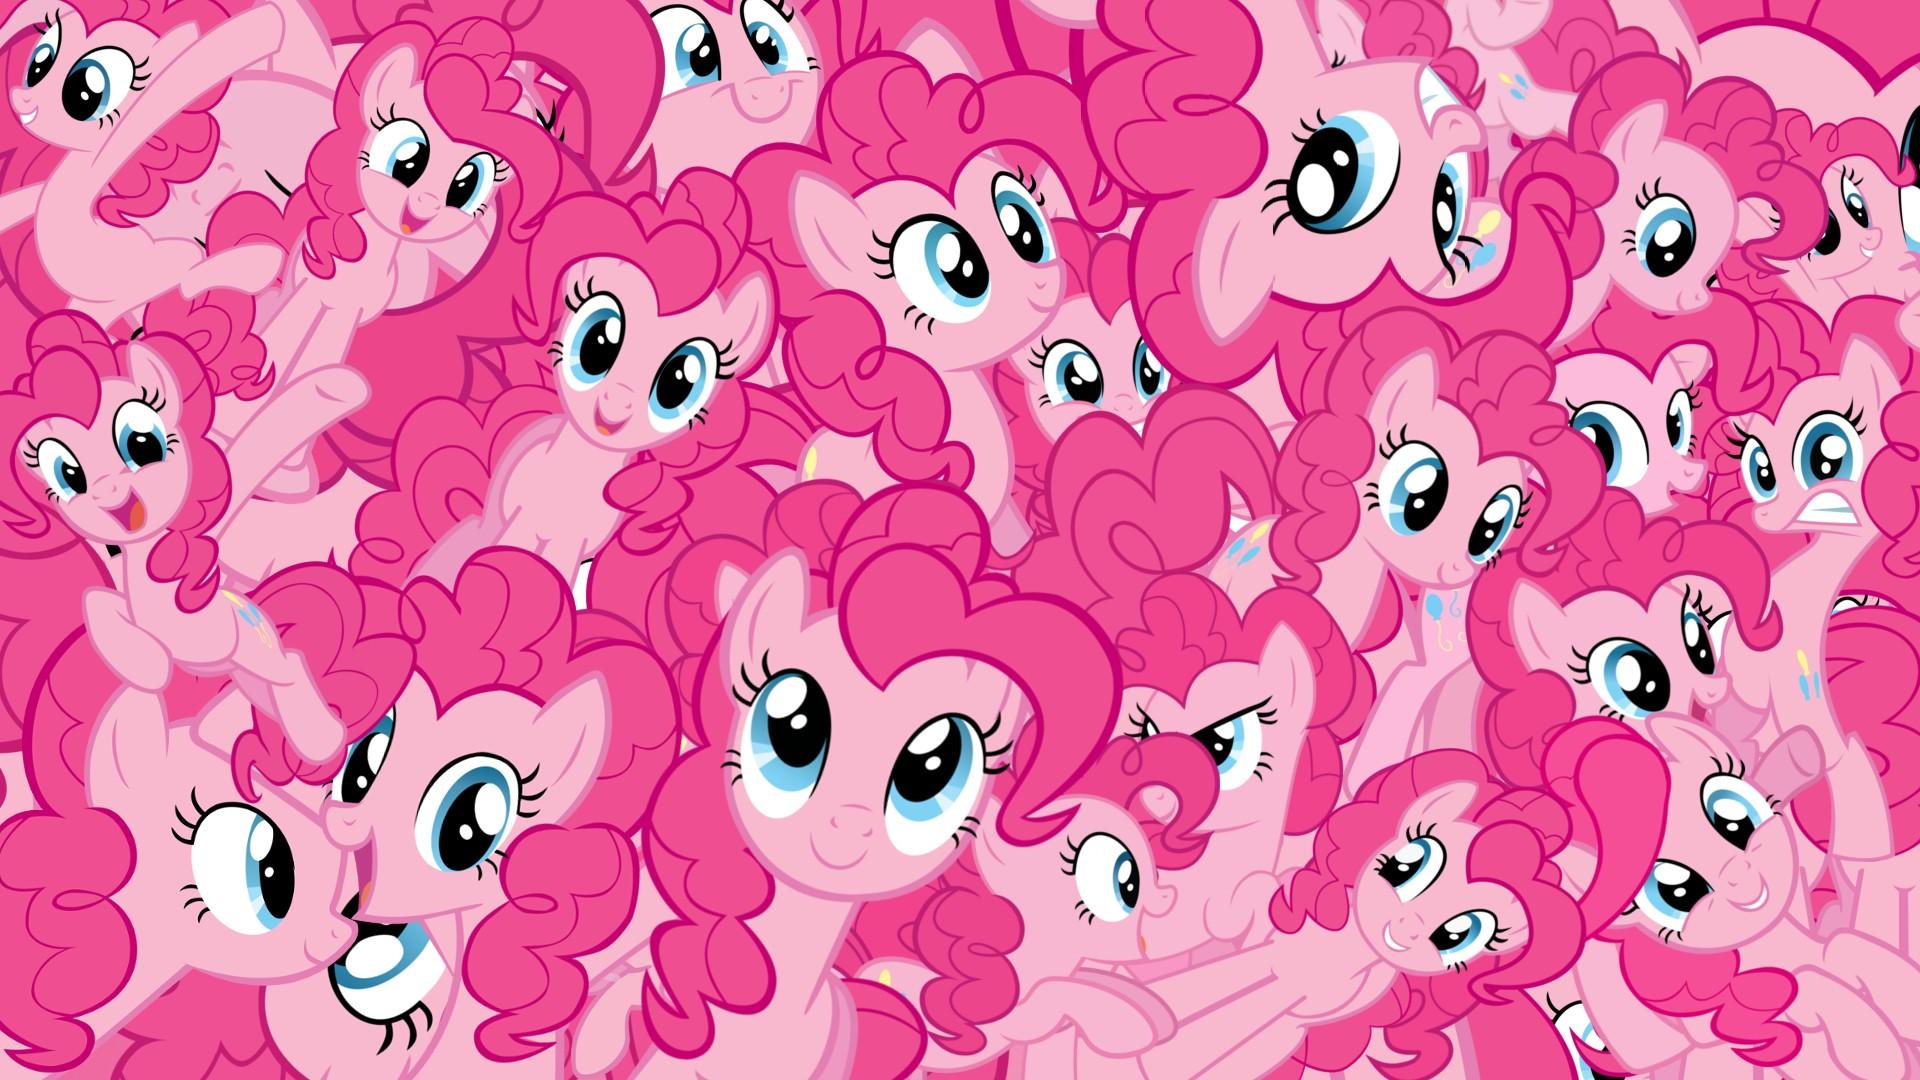 Pinkie Pie Wallpaper 1 Download Free HD Wallpapers For Desktop